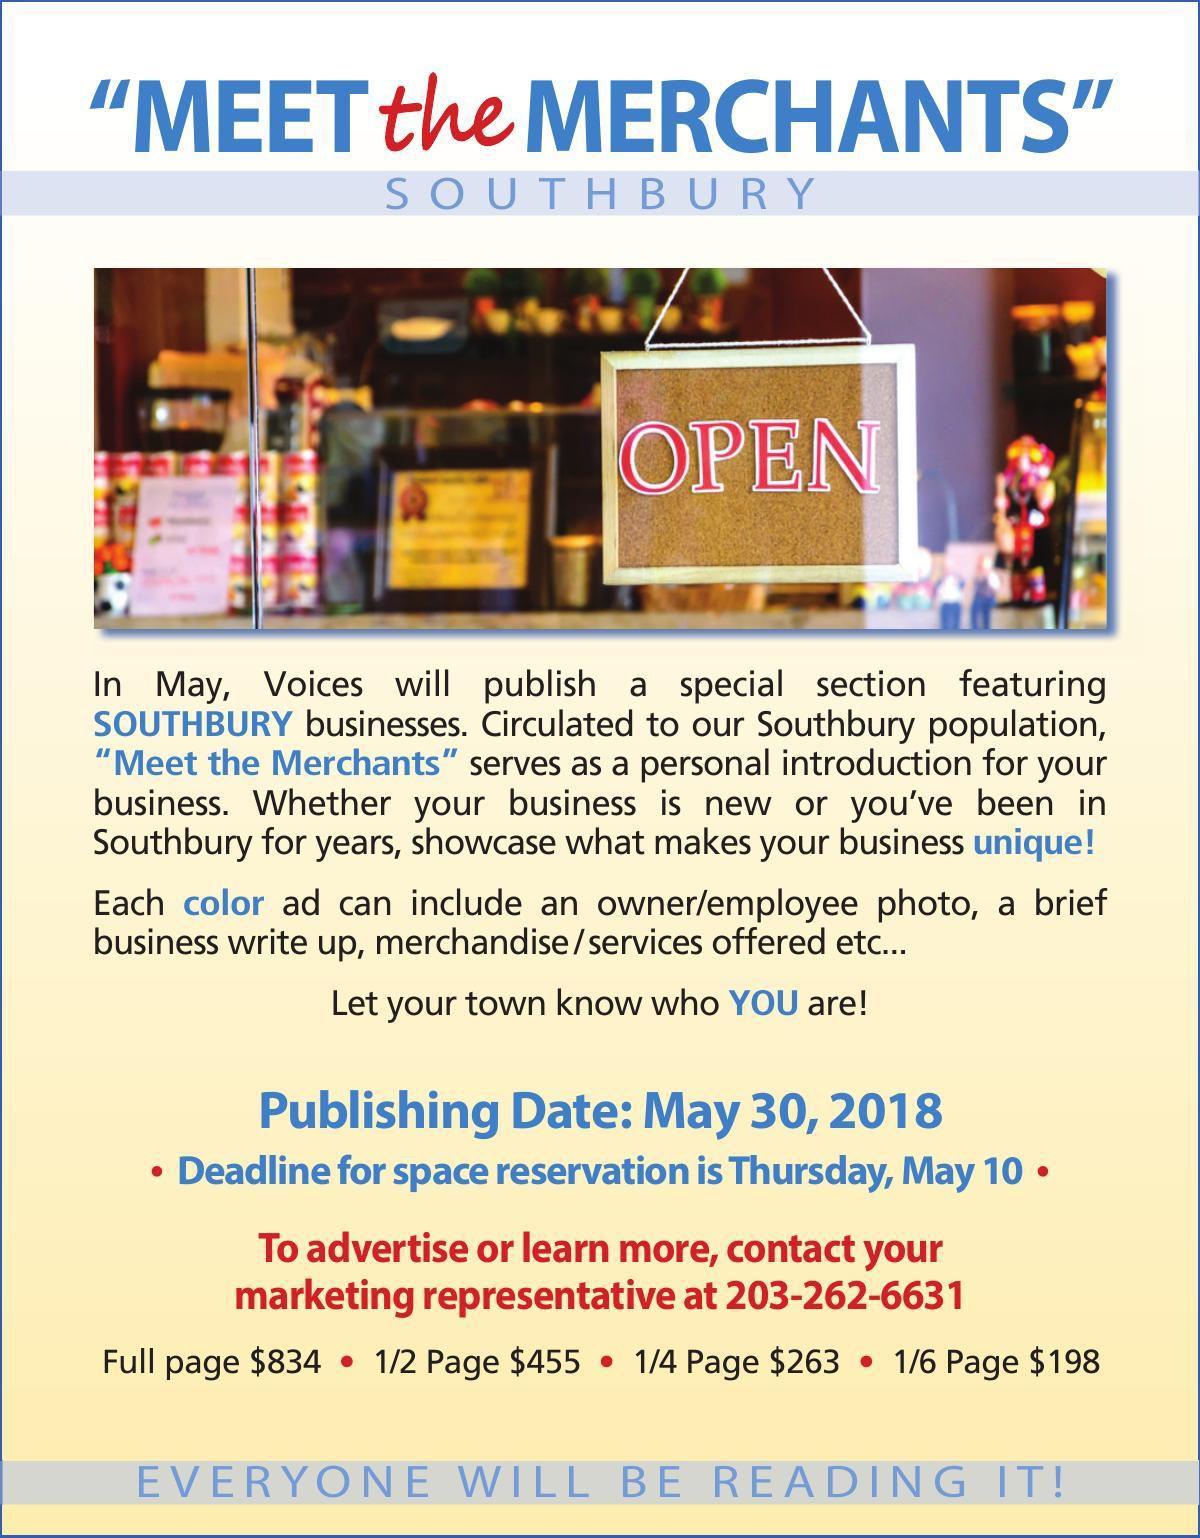 Meet the Southbury Merchants 2018